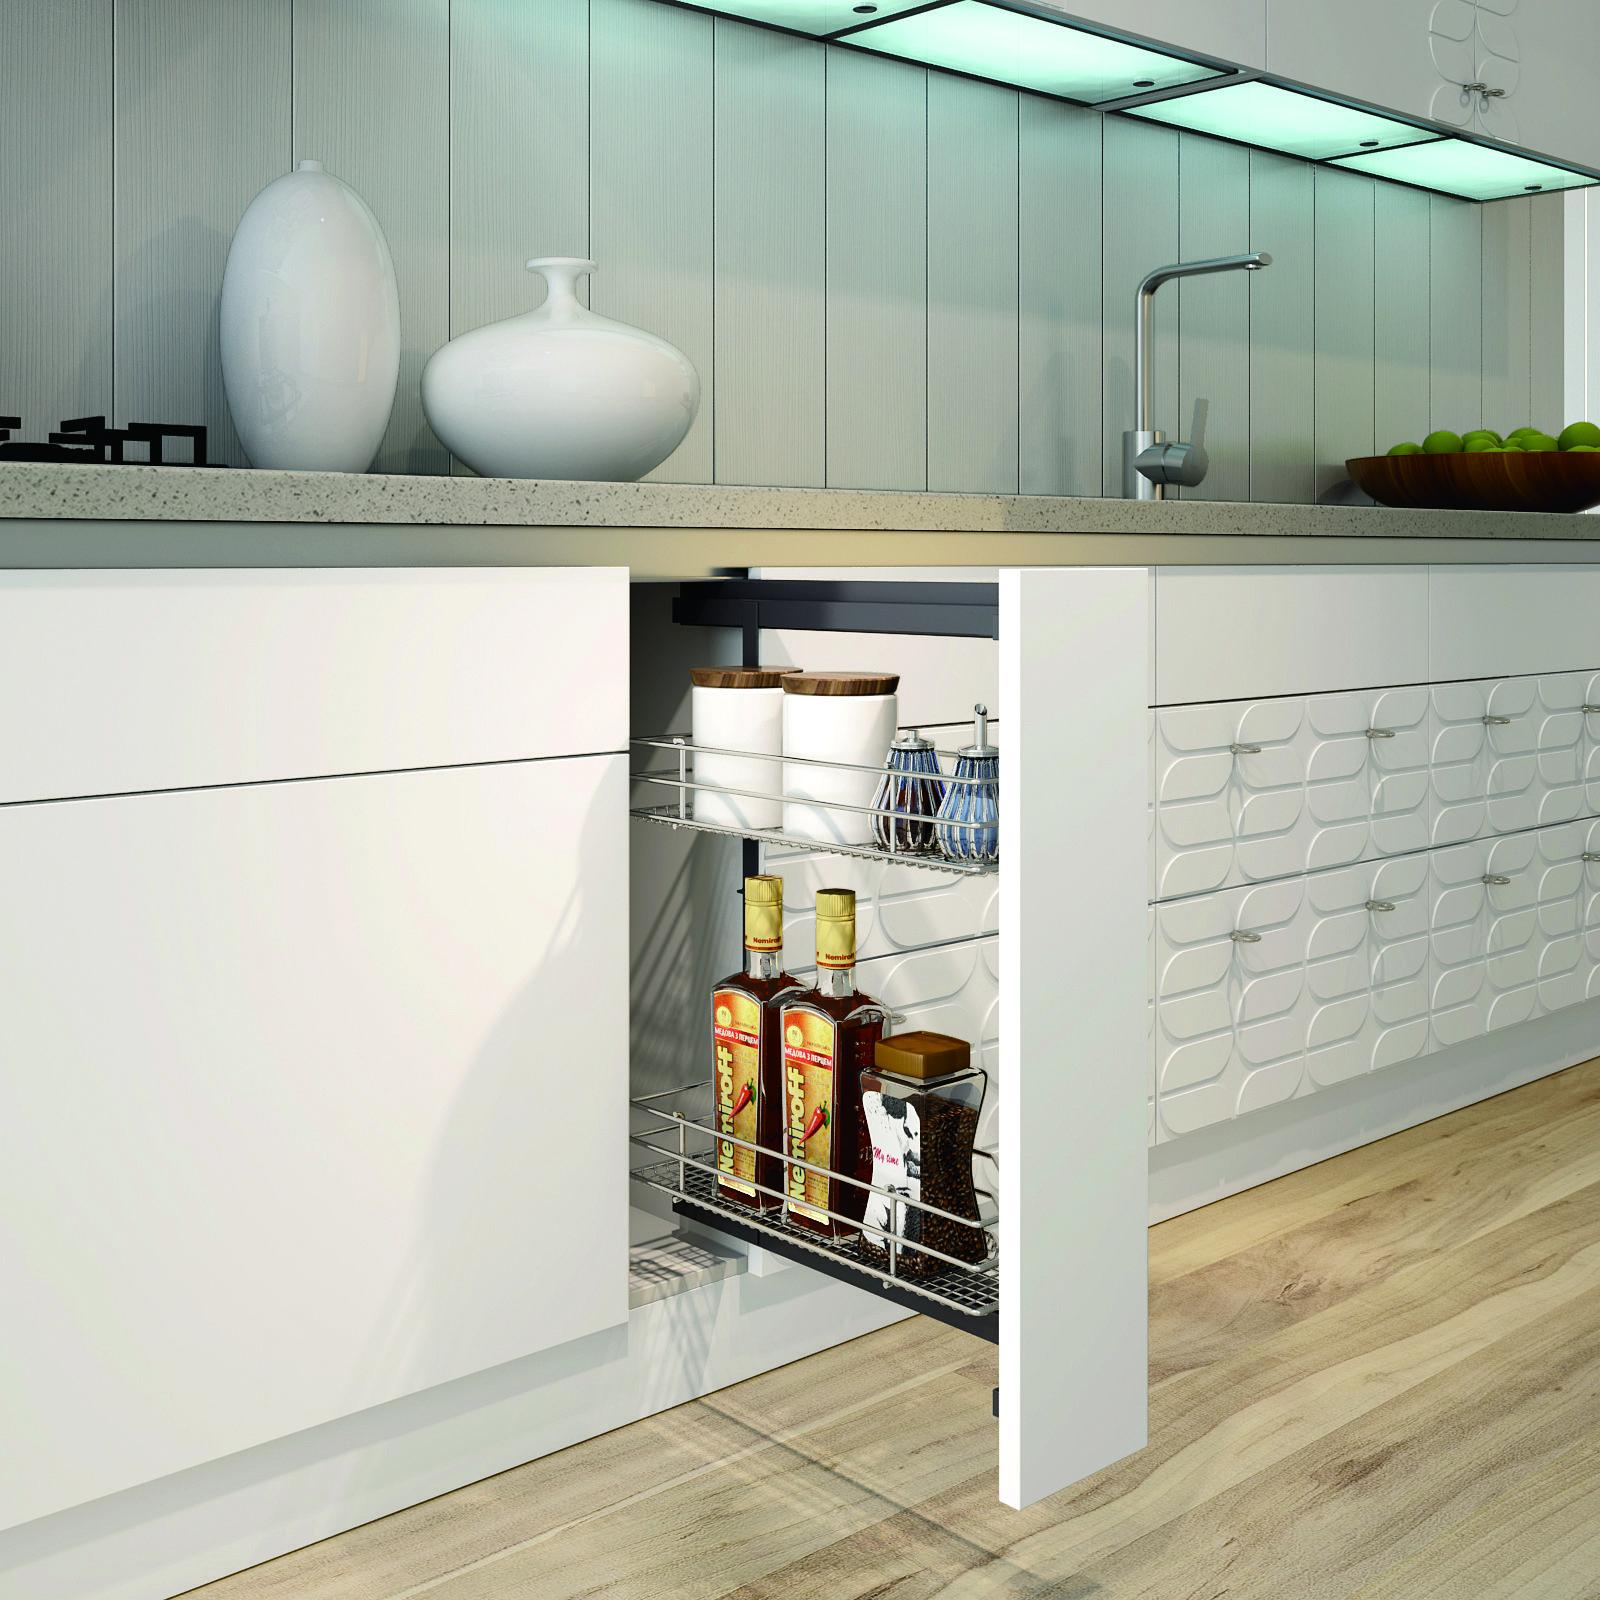 Pin By Zbomcabinets On Macchiata Kitchen Kitchen Kitchen Cabinets Cabinet Manufacturers